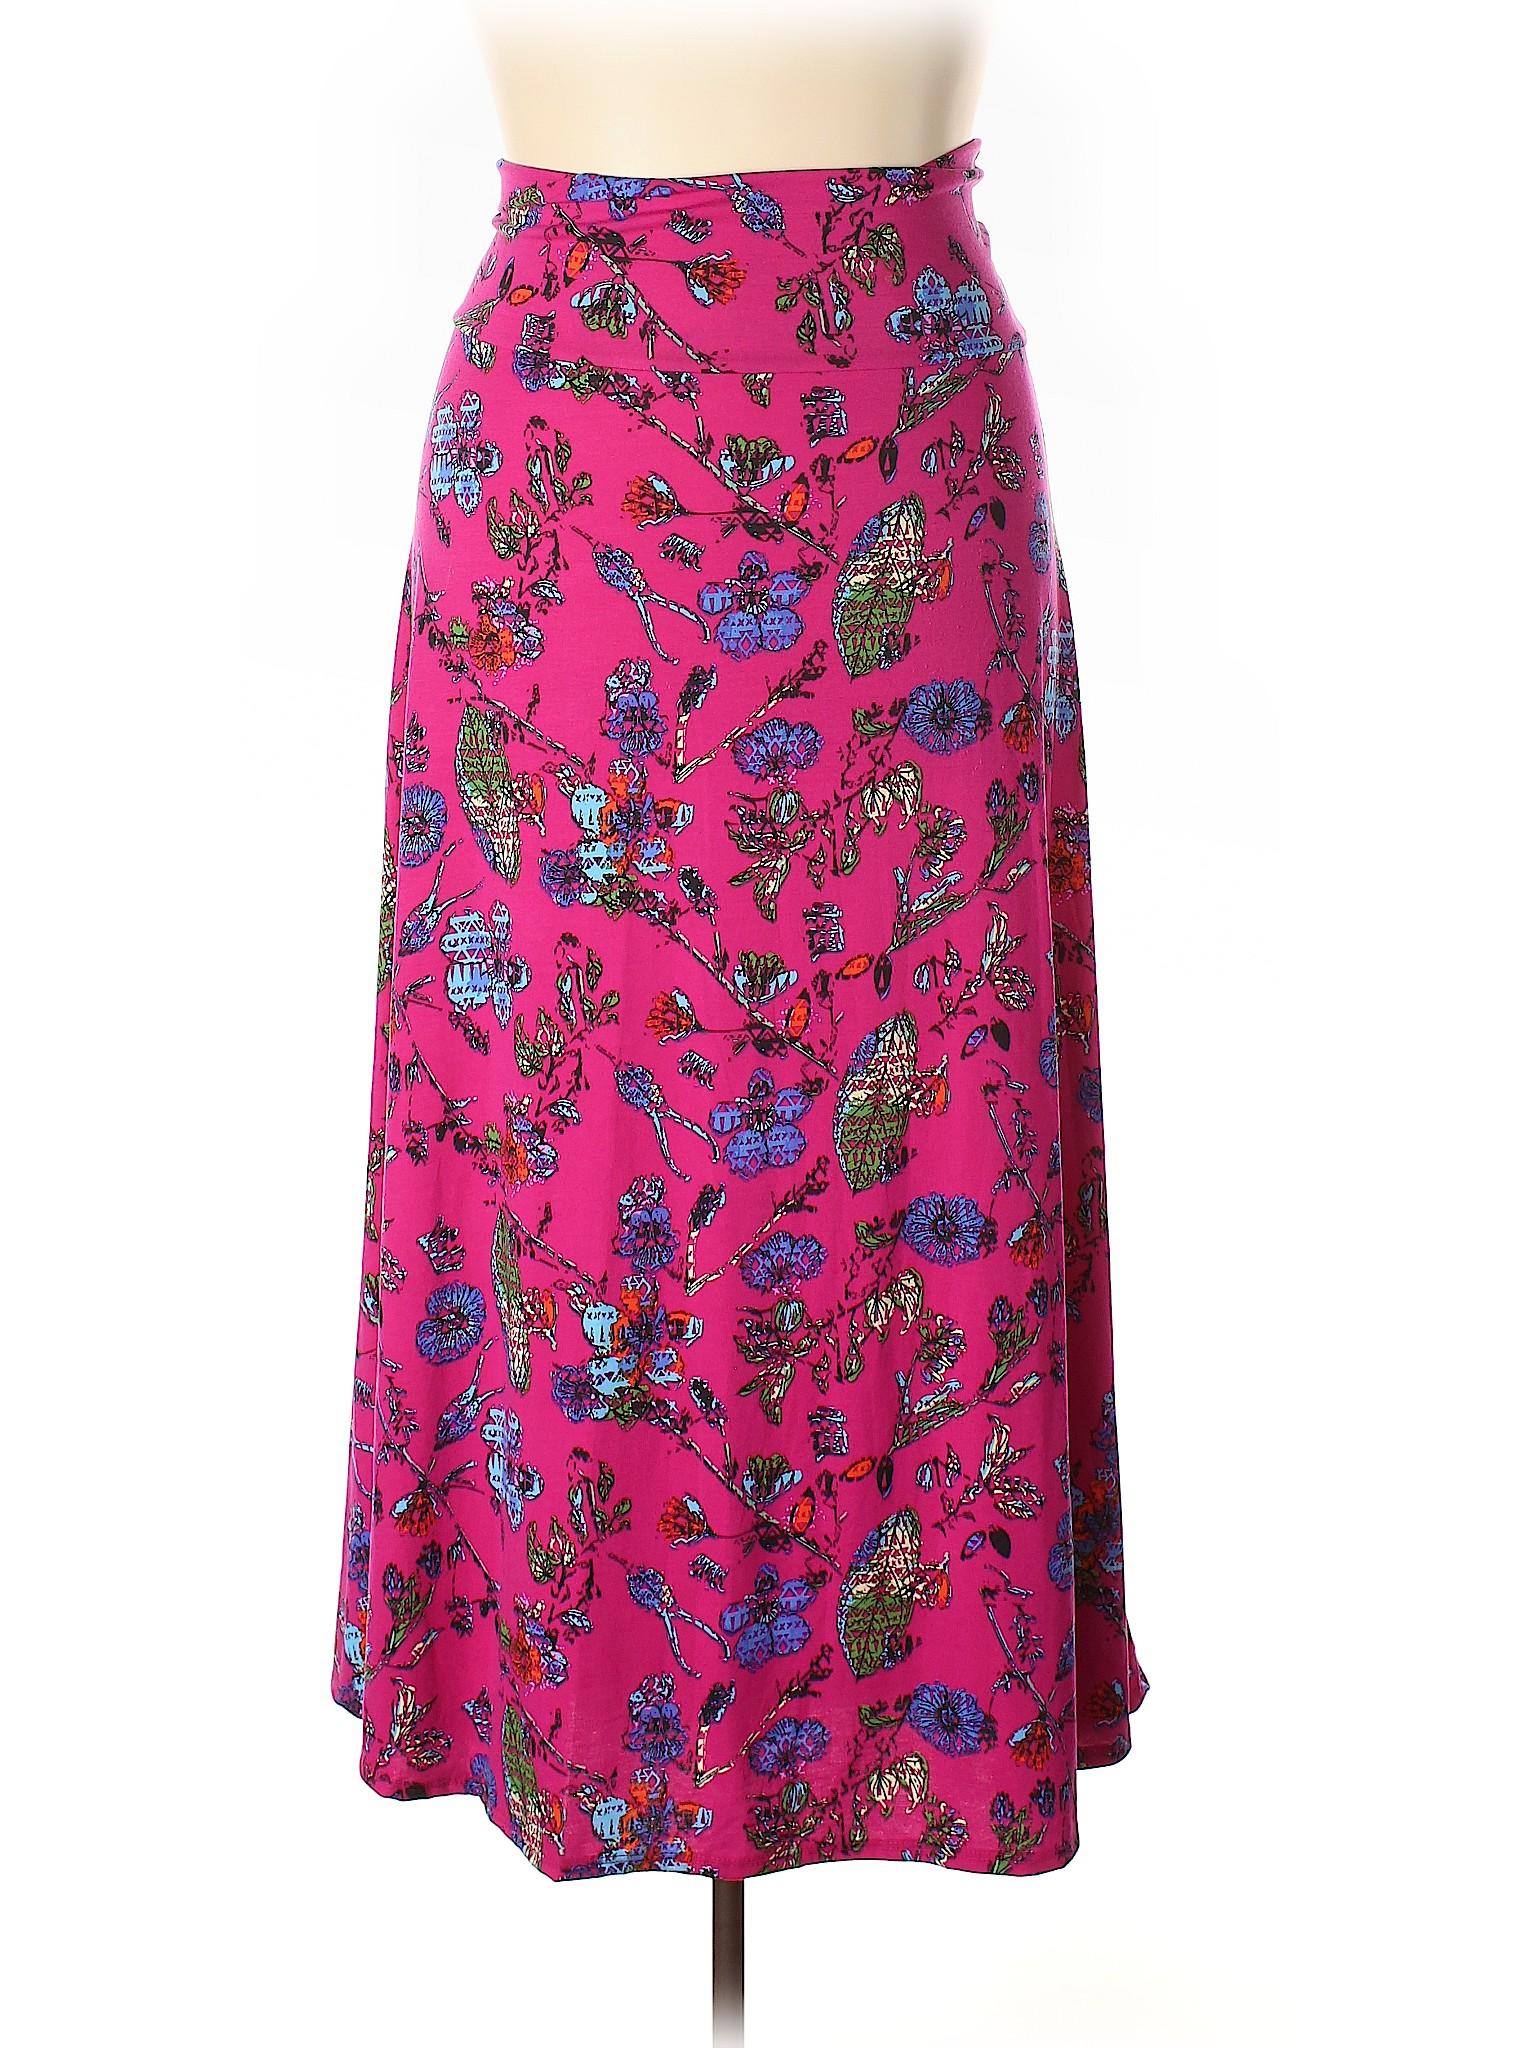 Boutique Skirt Casual Lularoe Skirt Casual Boutique Boutique Lularoe 0nW5qxvwz